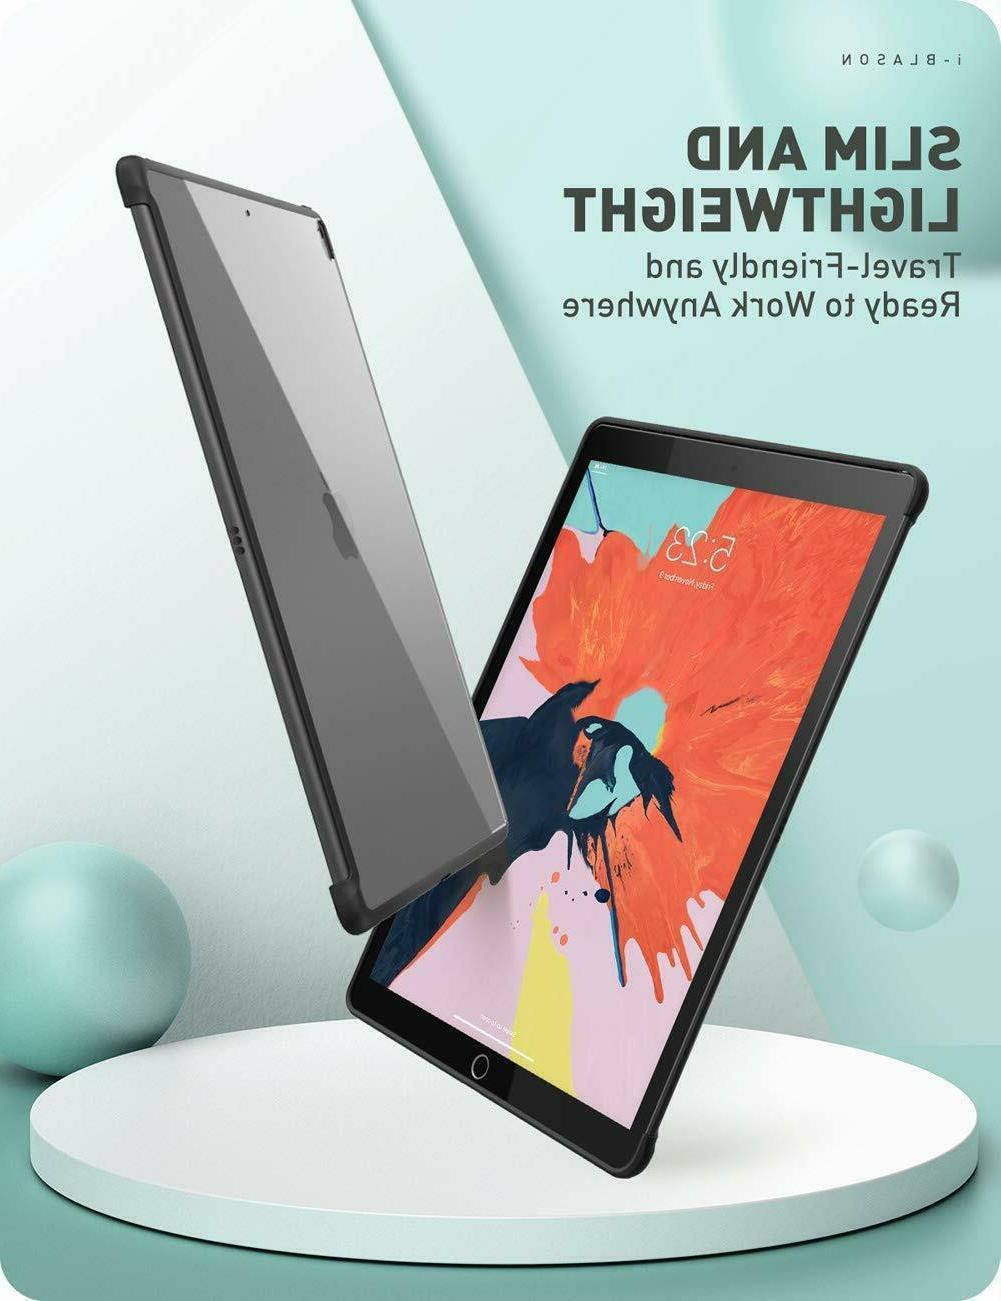 iPad Gen 10.2 2019 i-Blason Hybrid Cover For Smart Cover Keyboard